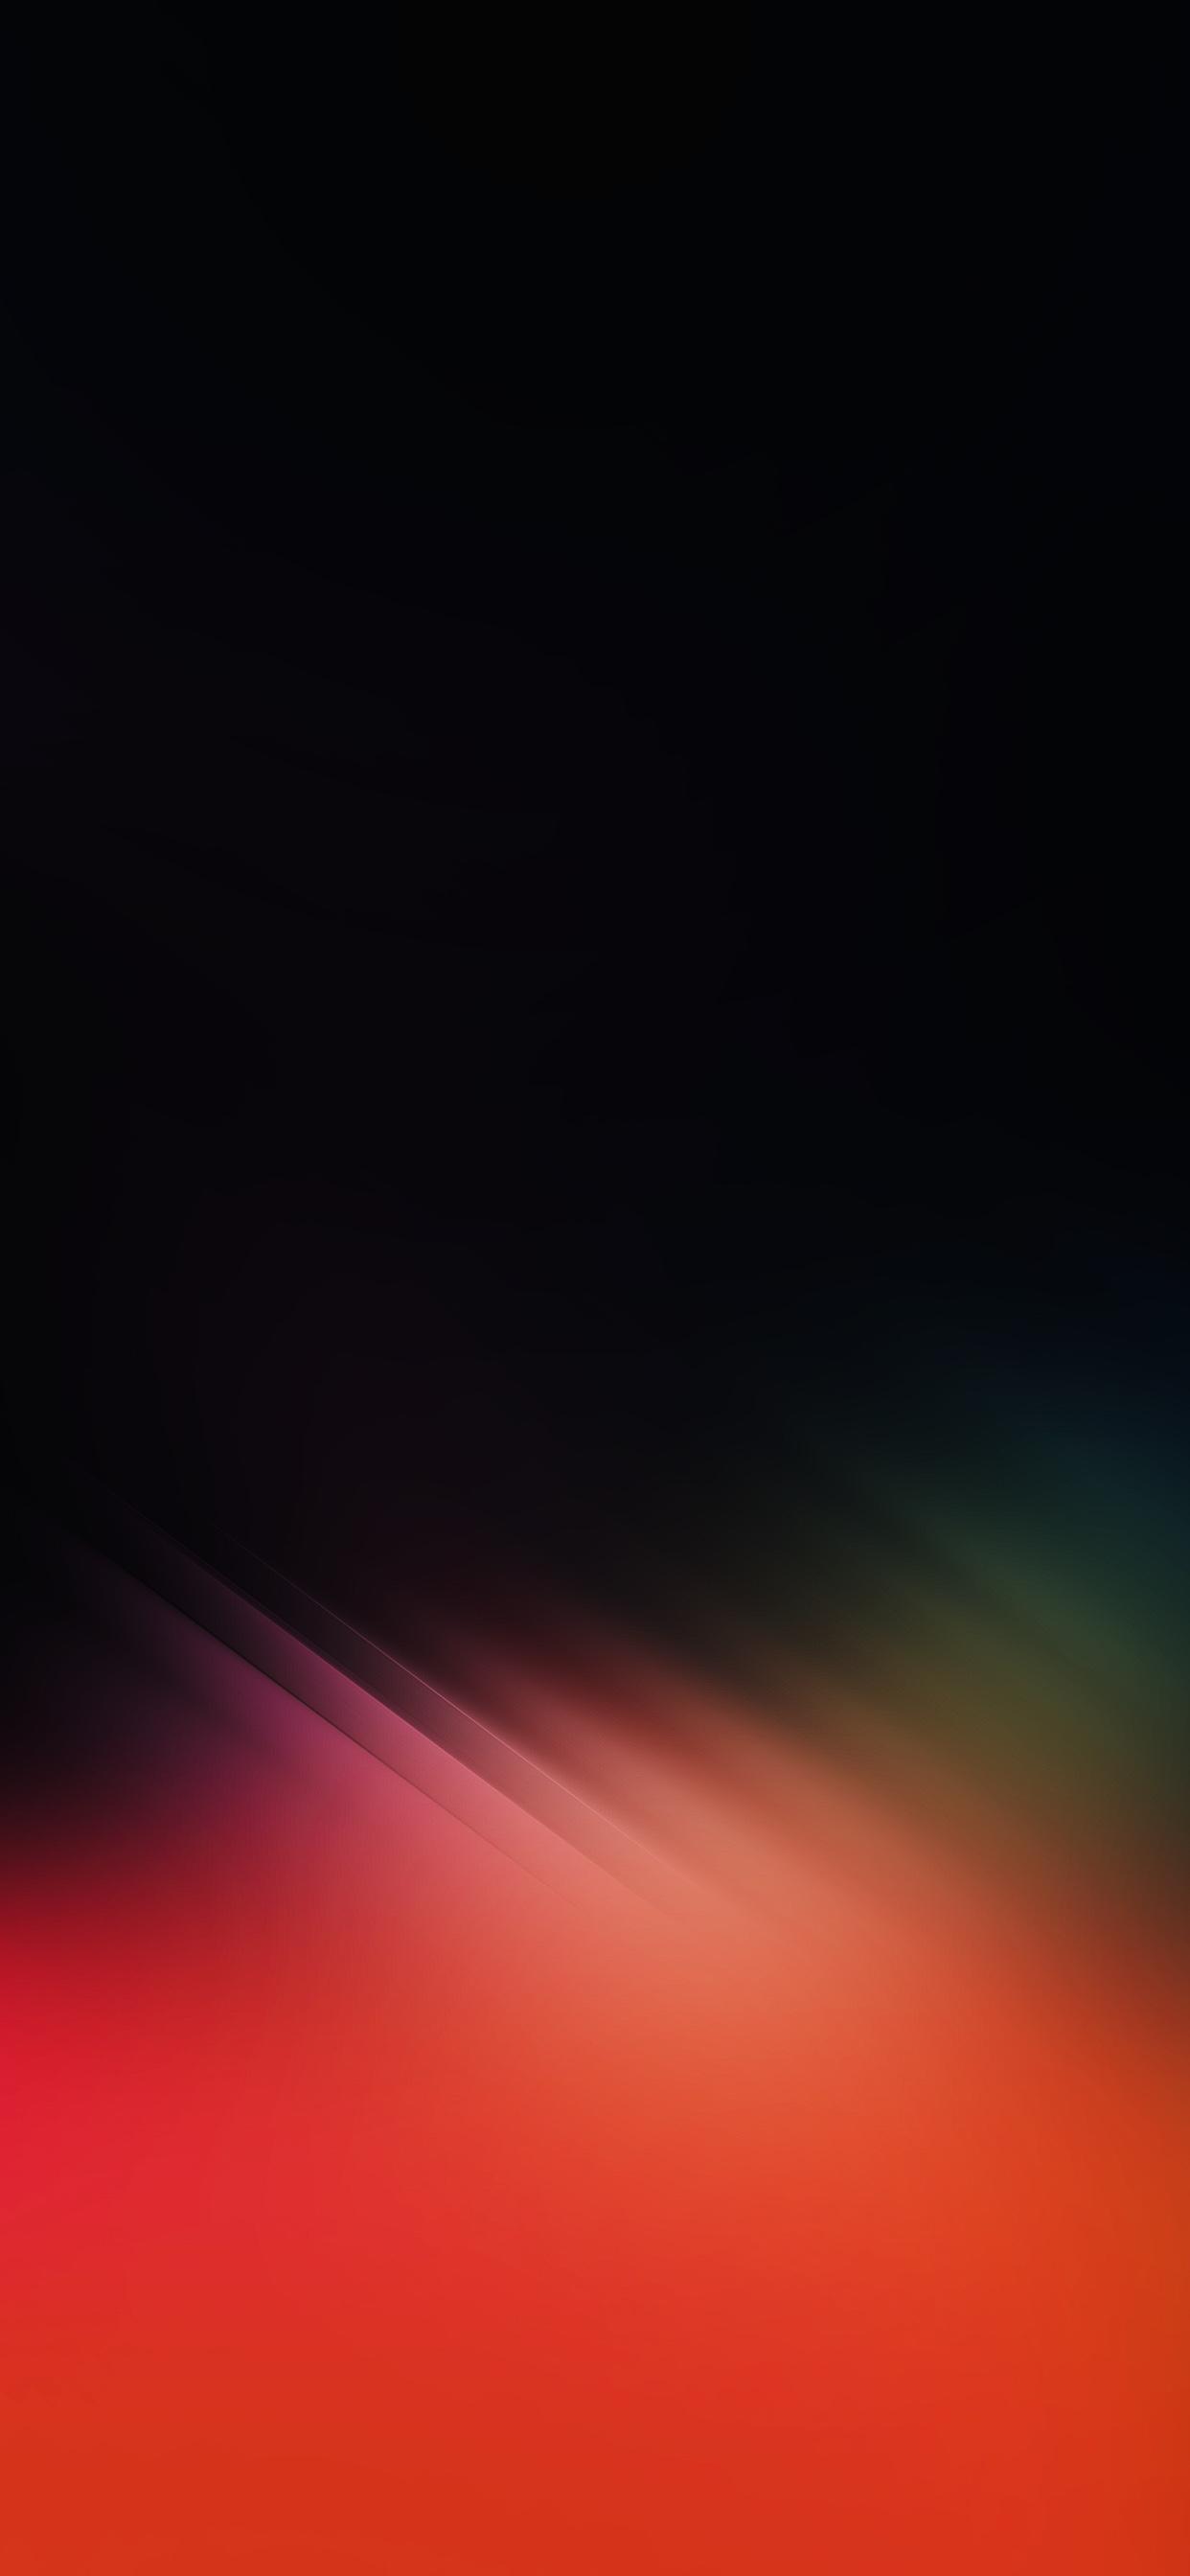 Black Wallpaper Iphone 7 Plus Wallpaper Backgrounds Zollotech